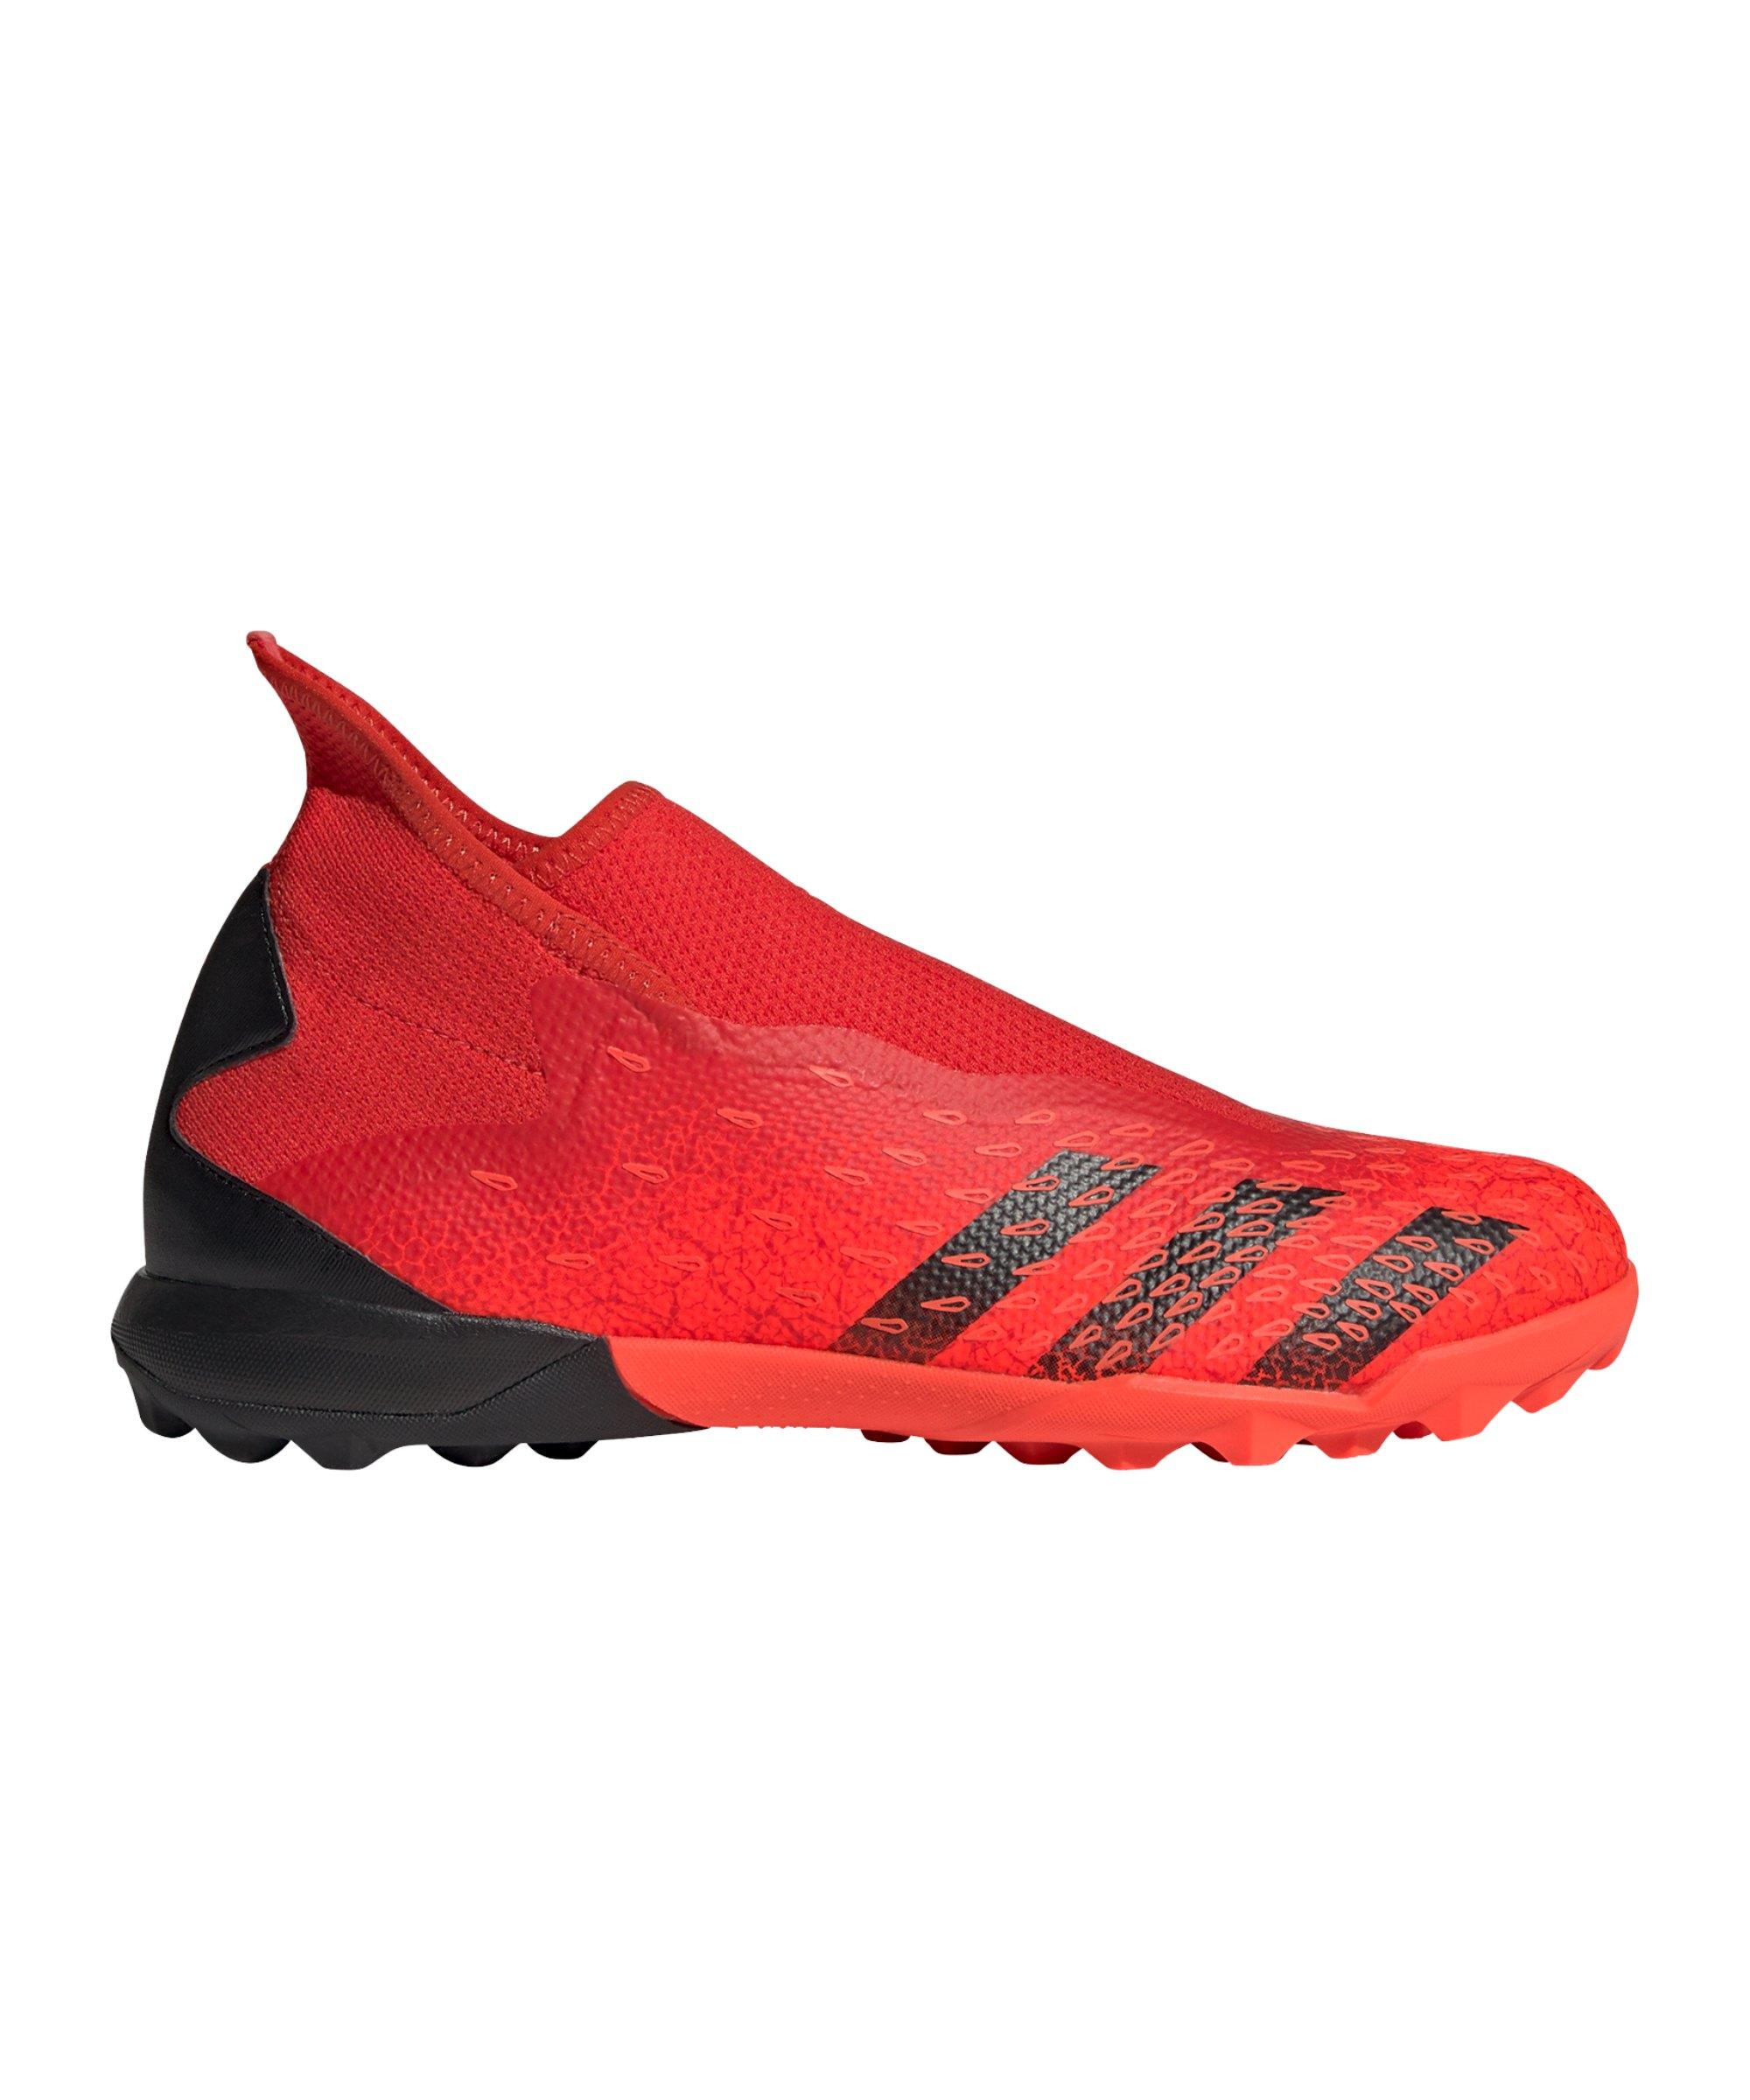 adidas Predator FREAK.3 LL TF Meteorite Rot Schwarz - rot